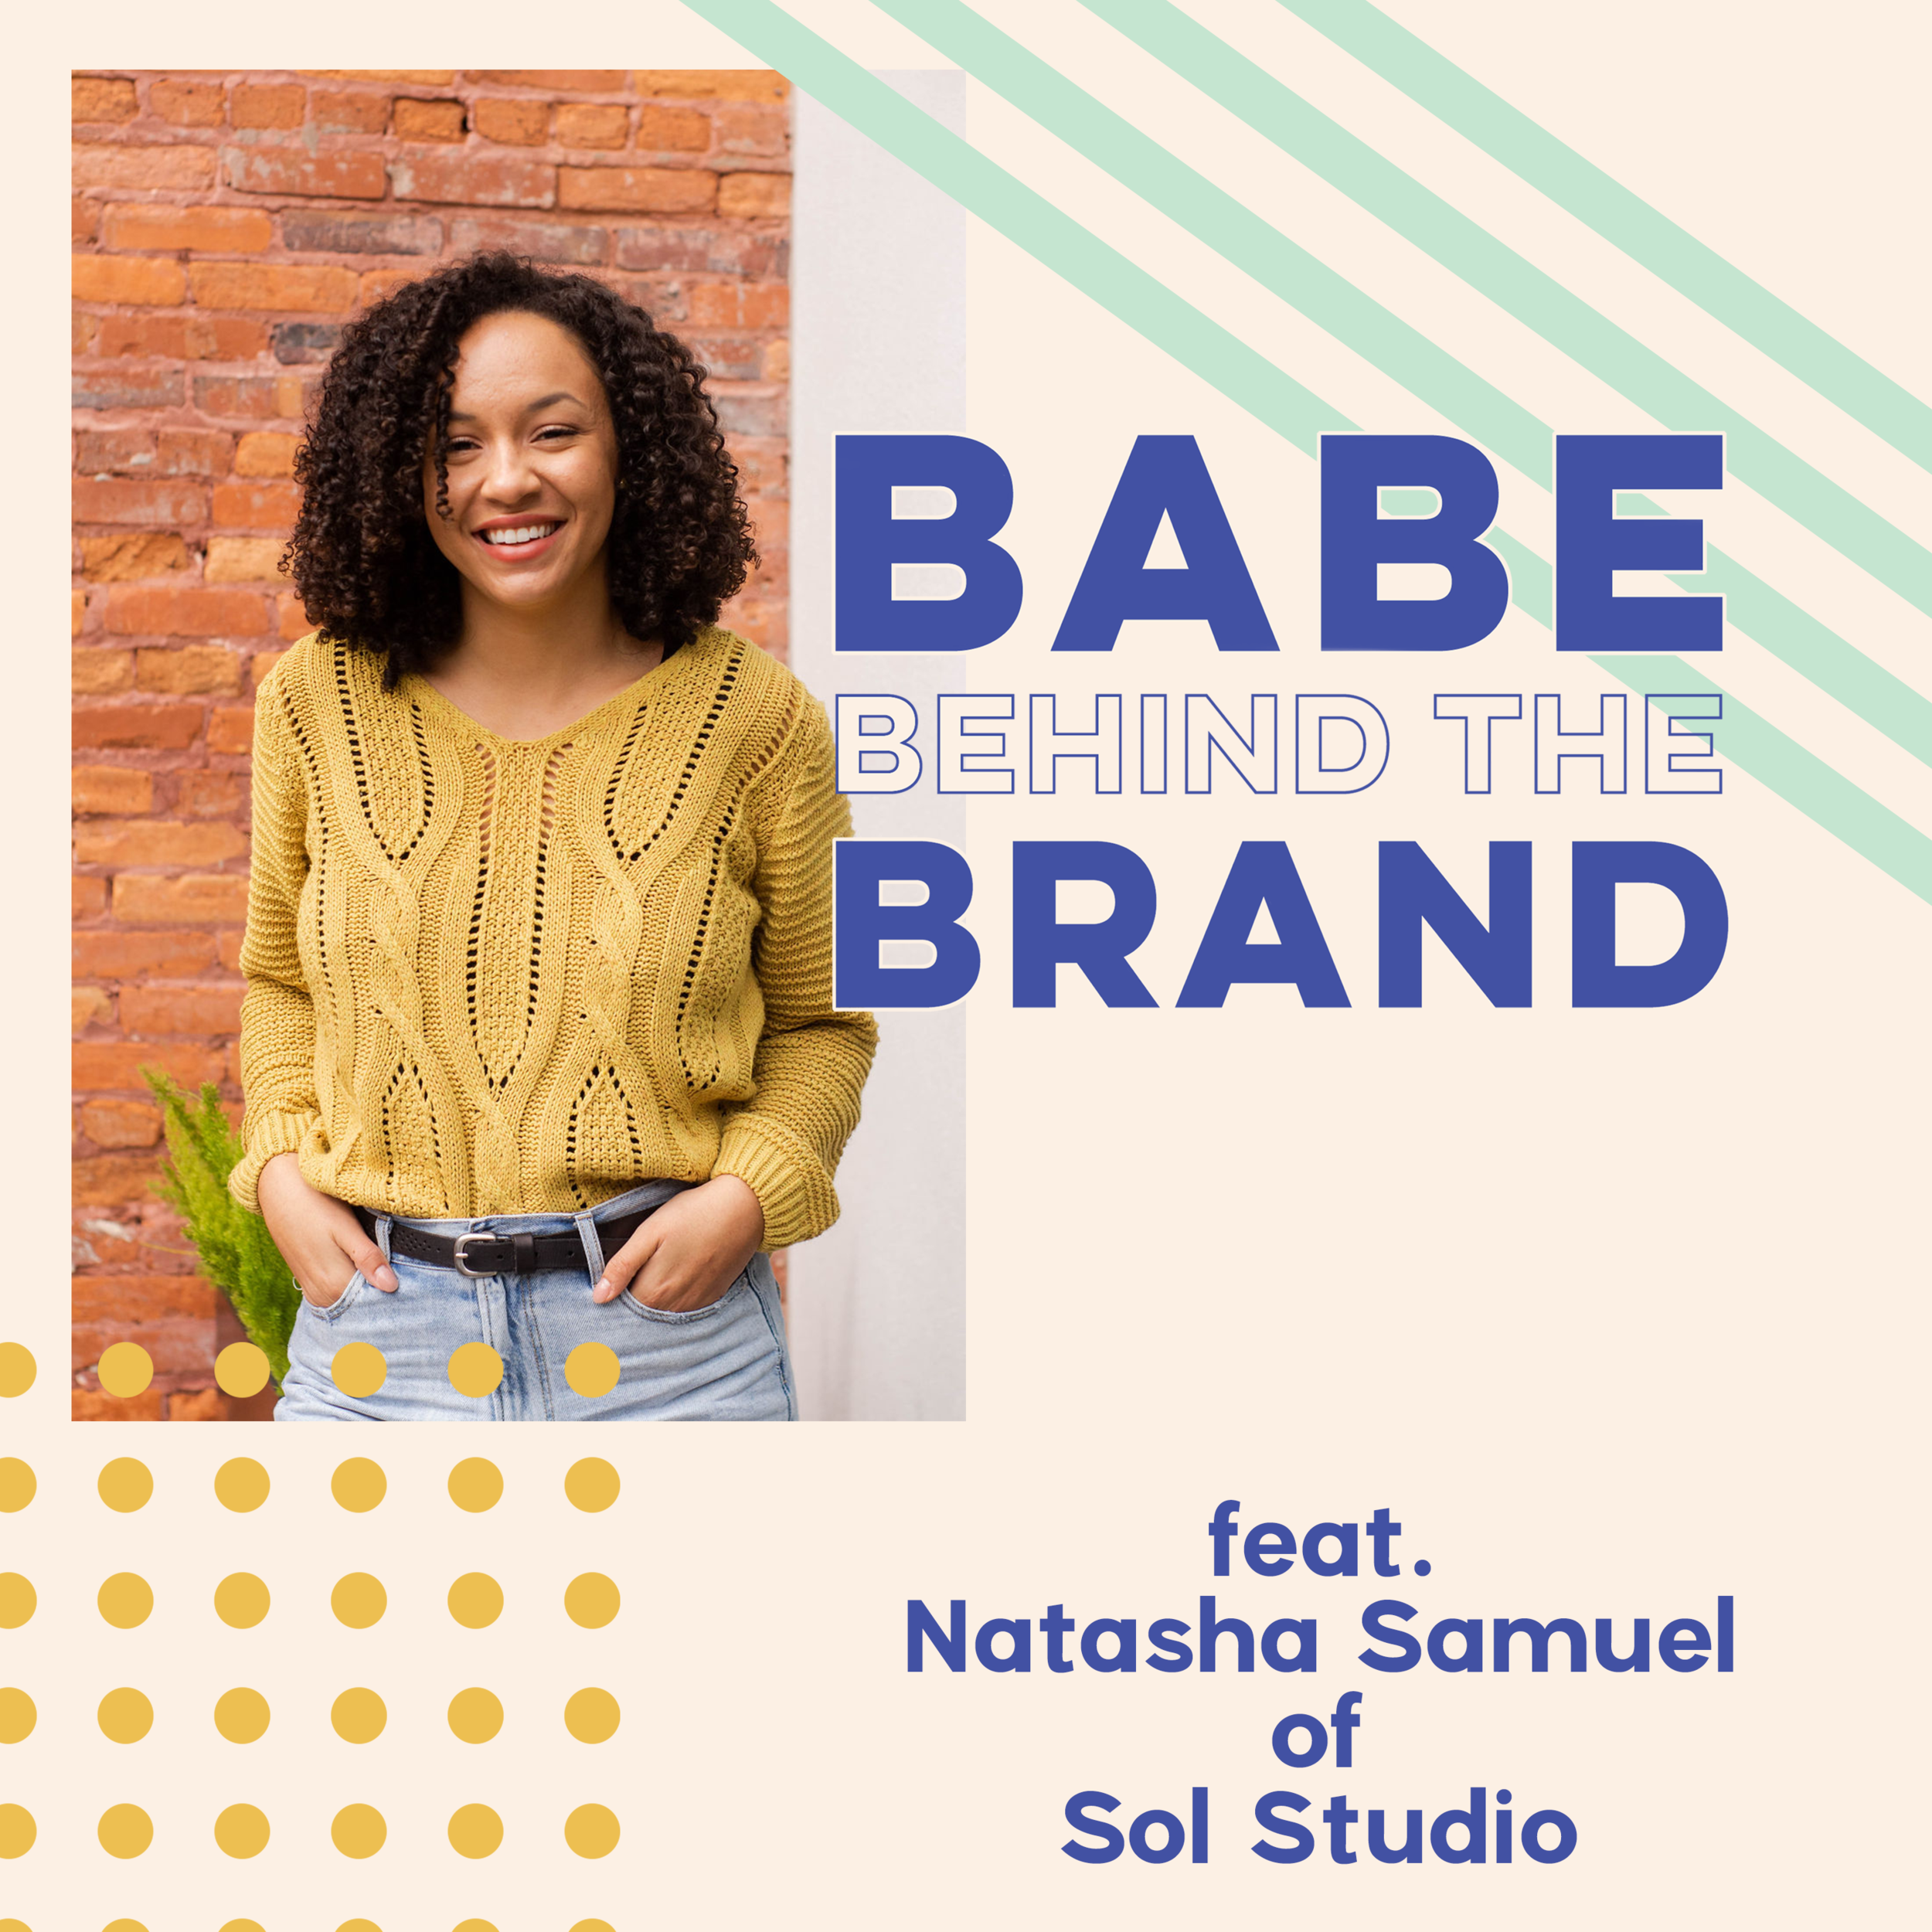 Babe Behind The Brand_Natasha Samuel_Sol Studio_Babe Crafted.png